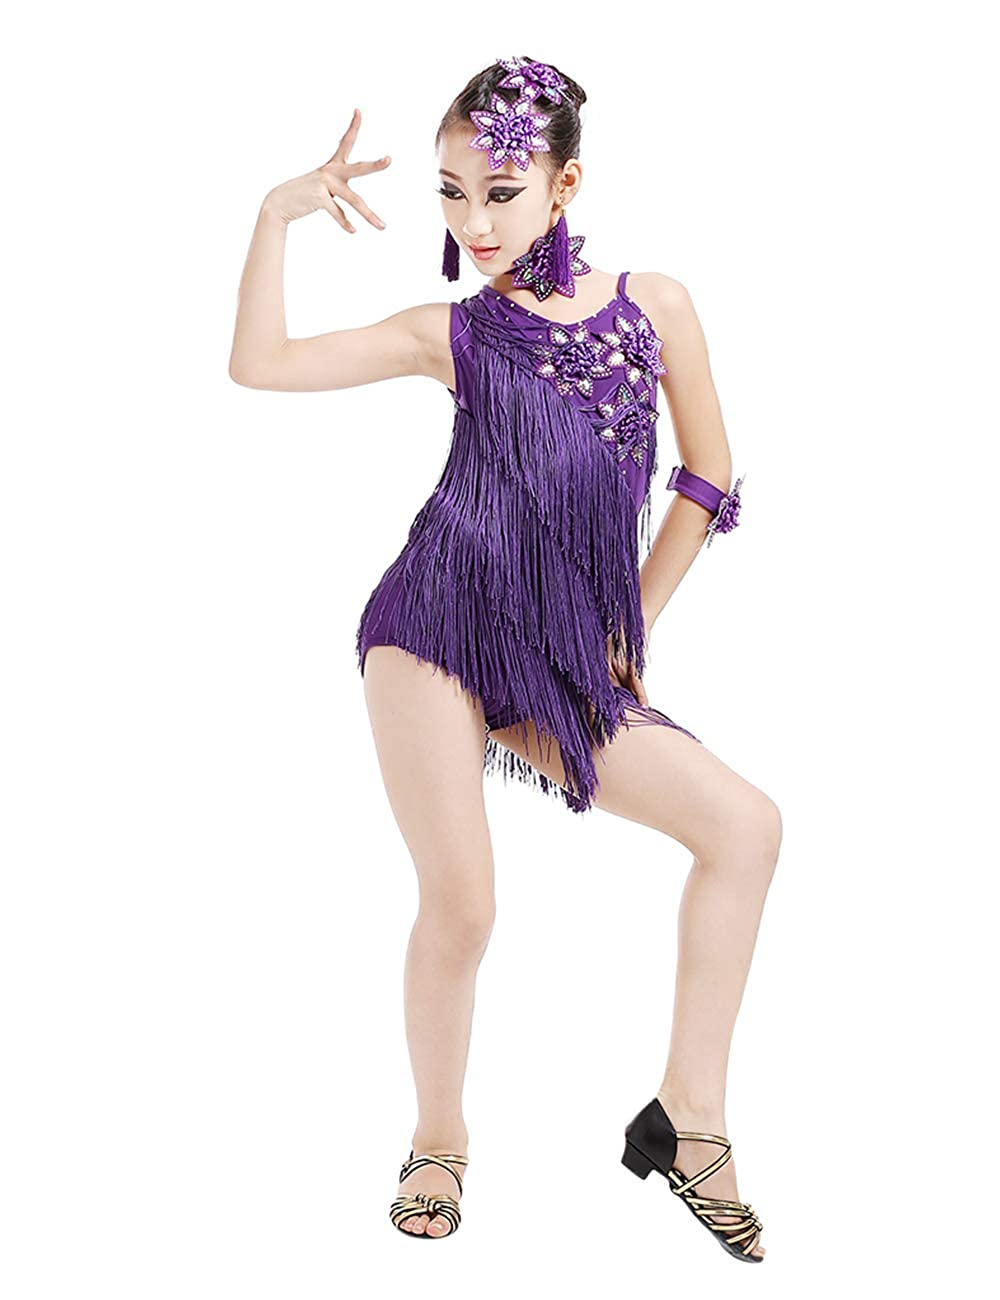 e54254fdcd32 besbomig Kids Party Performance Dancewear Salsa Tango Latin Dance Dress -  Girls Sequin Fringe Ballroom Dancer Costume Outfit  Amazon.co.uk  Clothing